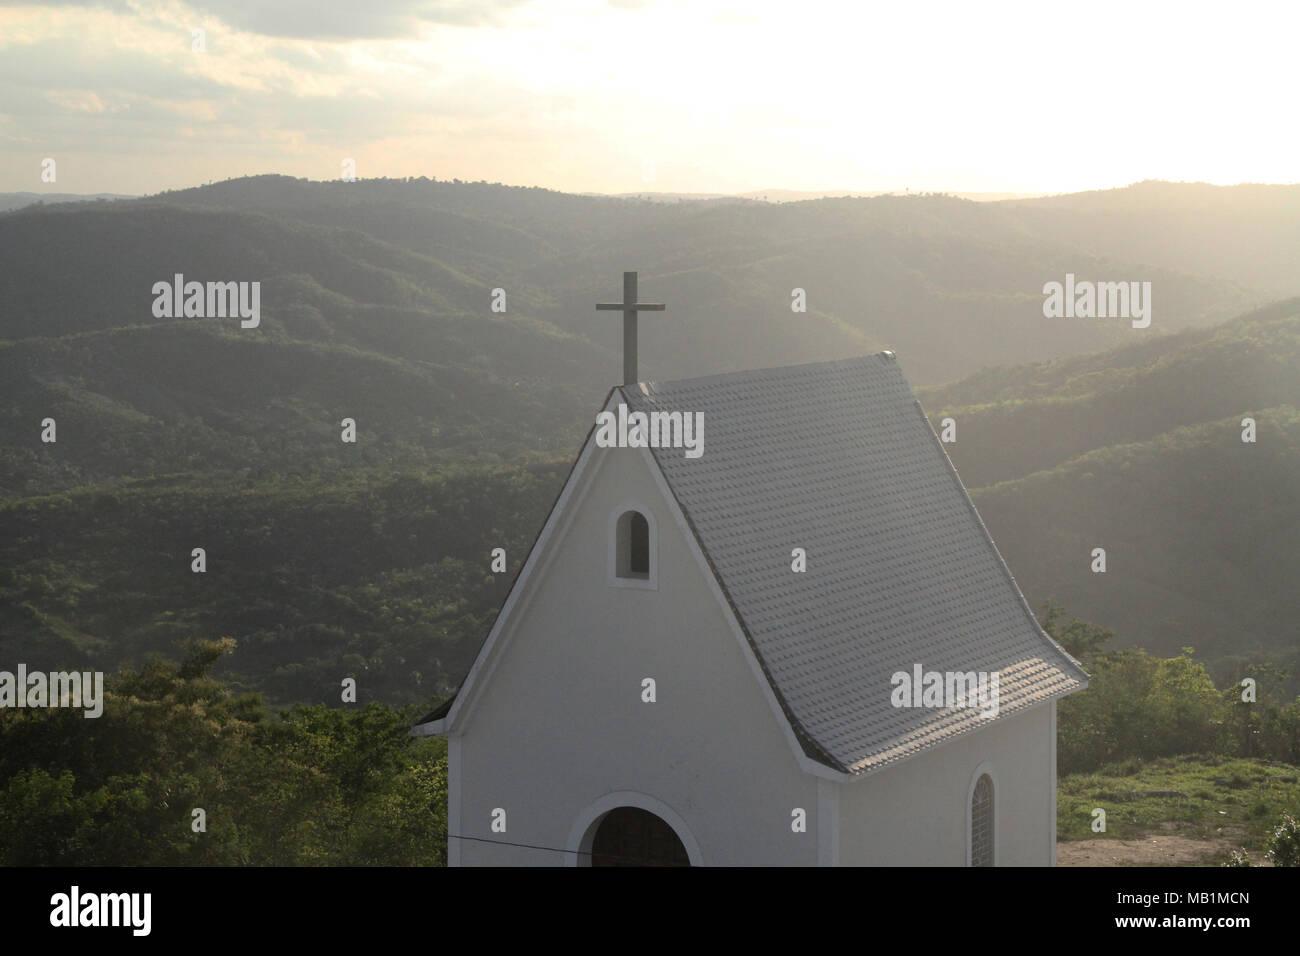 Chapel, Religious, Aerial view, Guarabira, Paraiba, Brazil Stock Photo